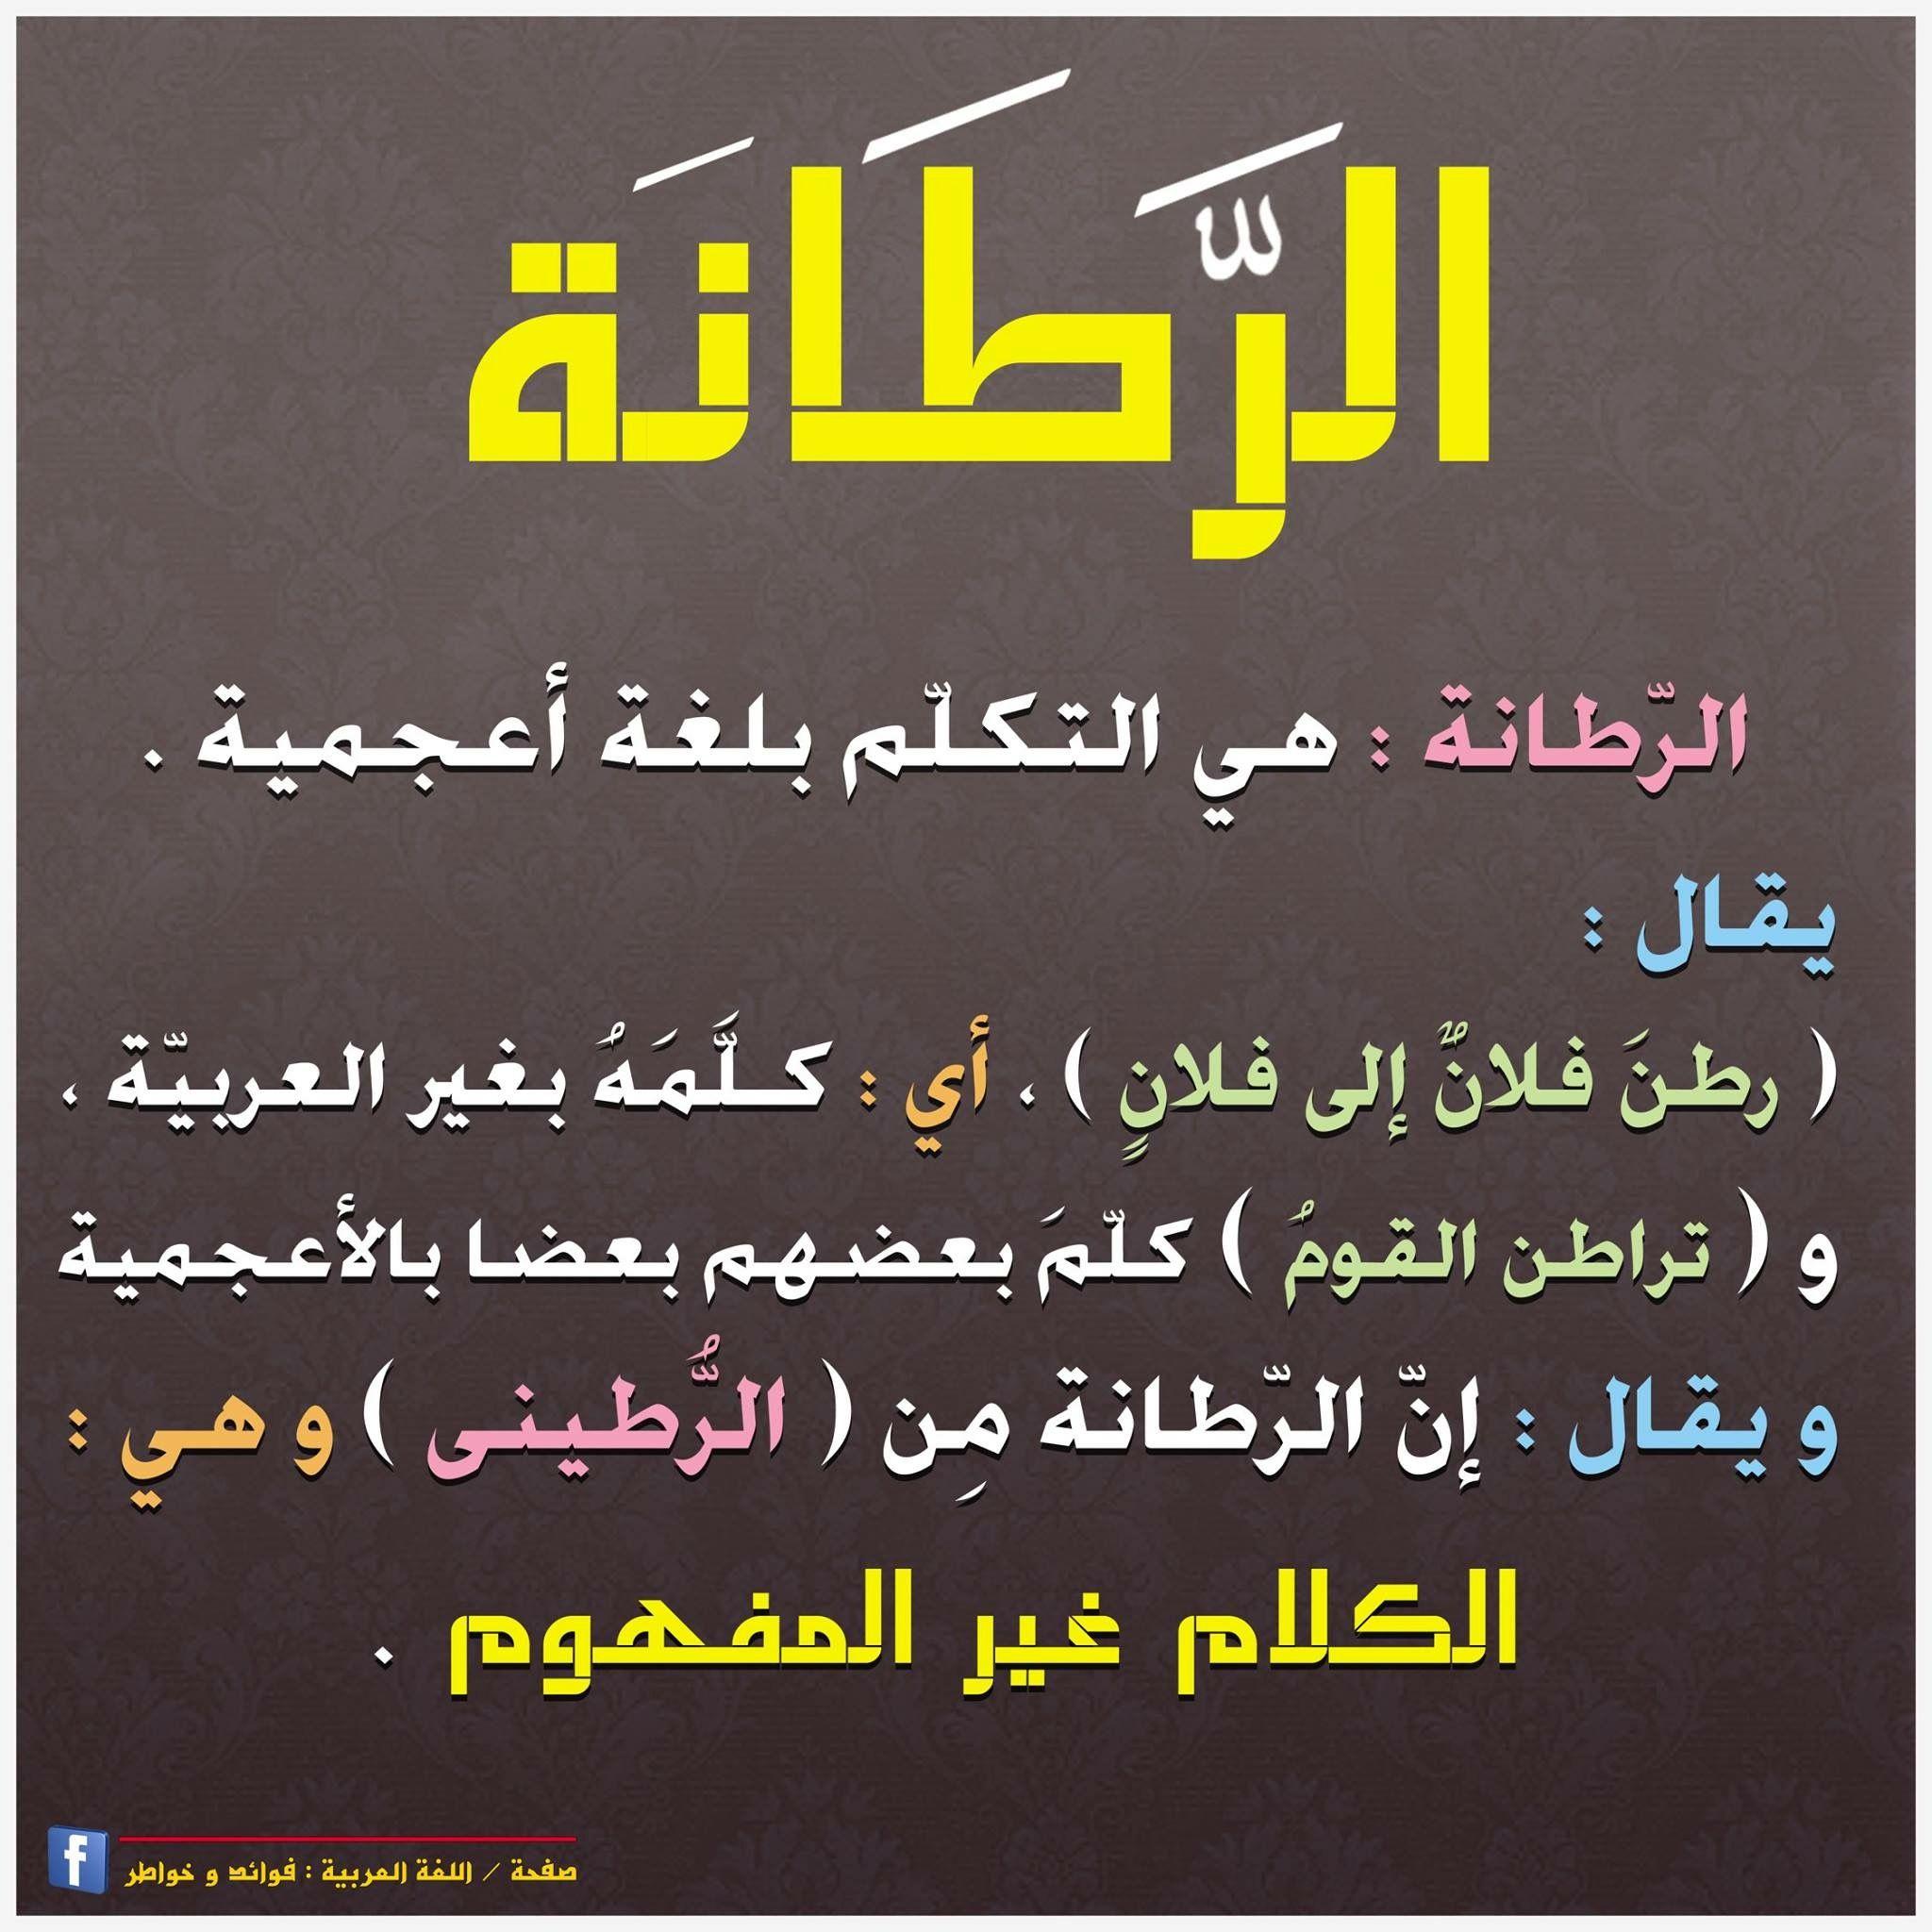 Pin By Naif Tamim On منوعة عربية Learn Arabic Language Beautiful Arabic Words Words Quotes